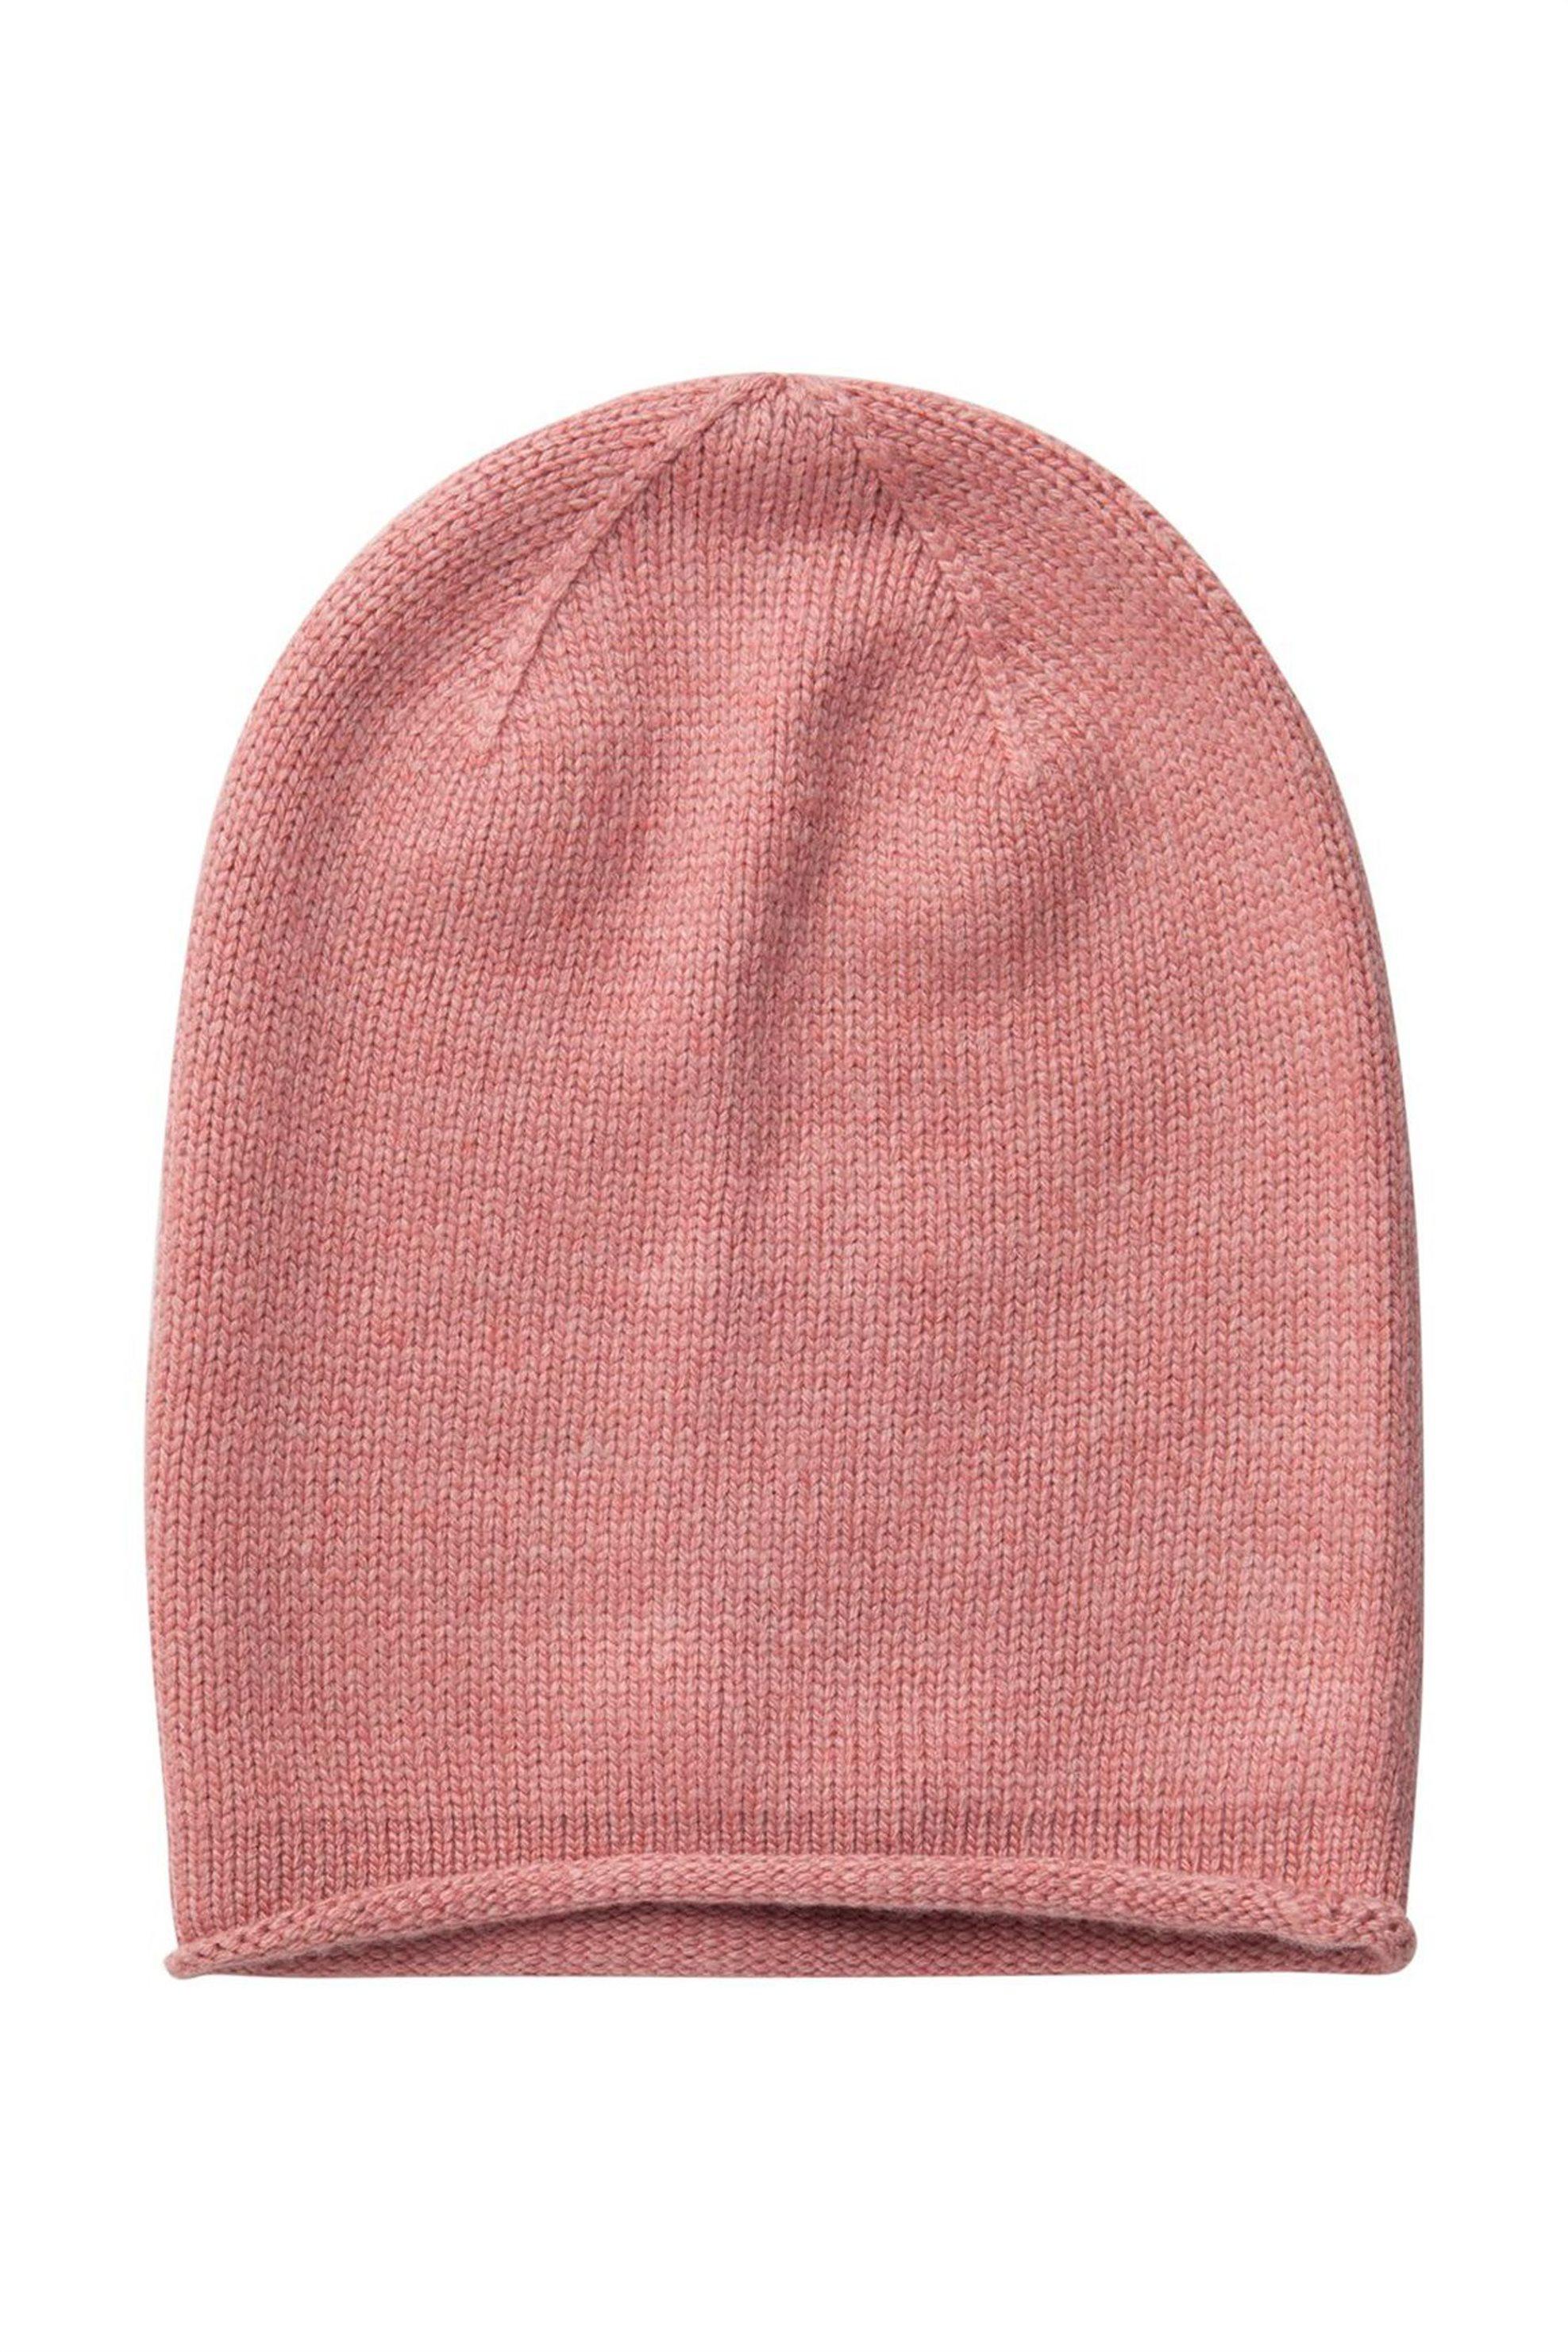 PIECES σκούφος cashmere Beanie μονόχρωμος - 17067018 - Ροζ γυναικα   αξεσουαρ   καπέλα  σκούφοι   αξεσουάρ